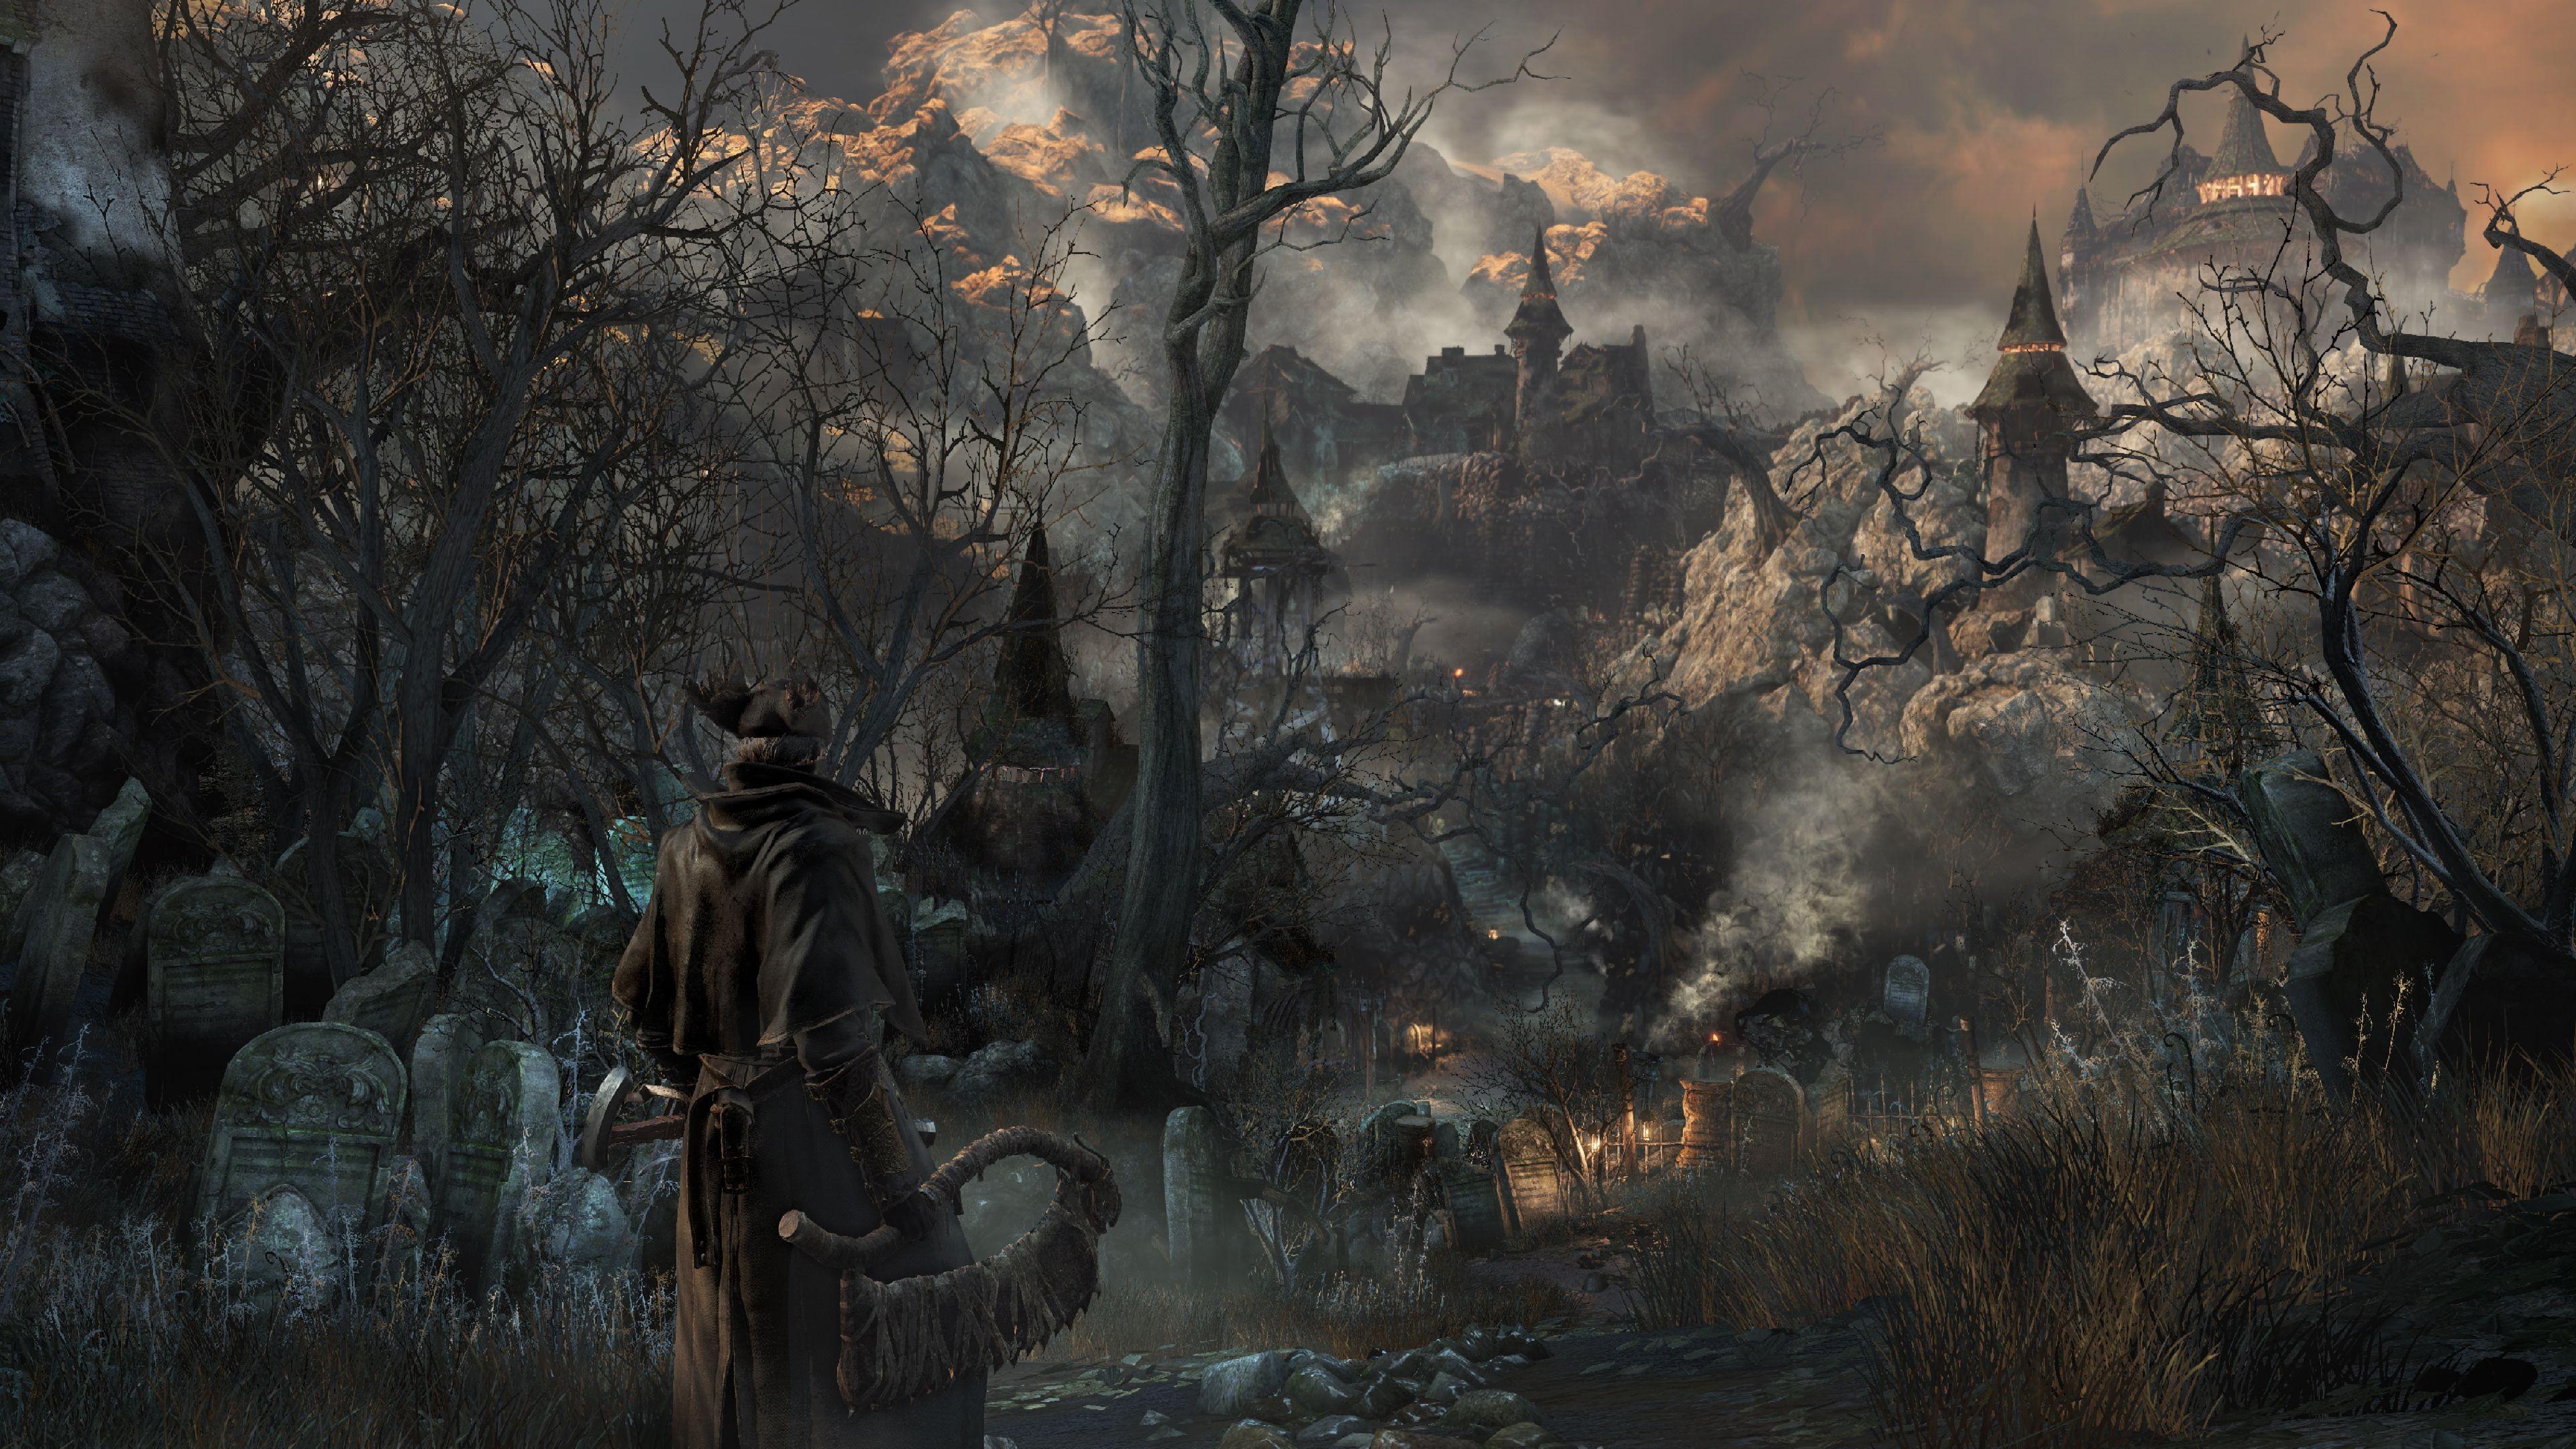 Wallpaper Bloodborne Gameplay Review Screenshot Interface Game Yharnam Best Games Of 2015